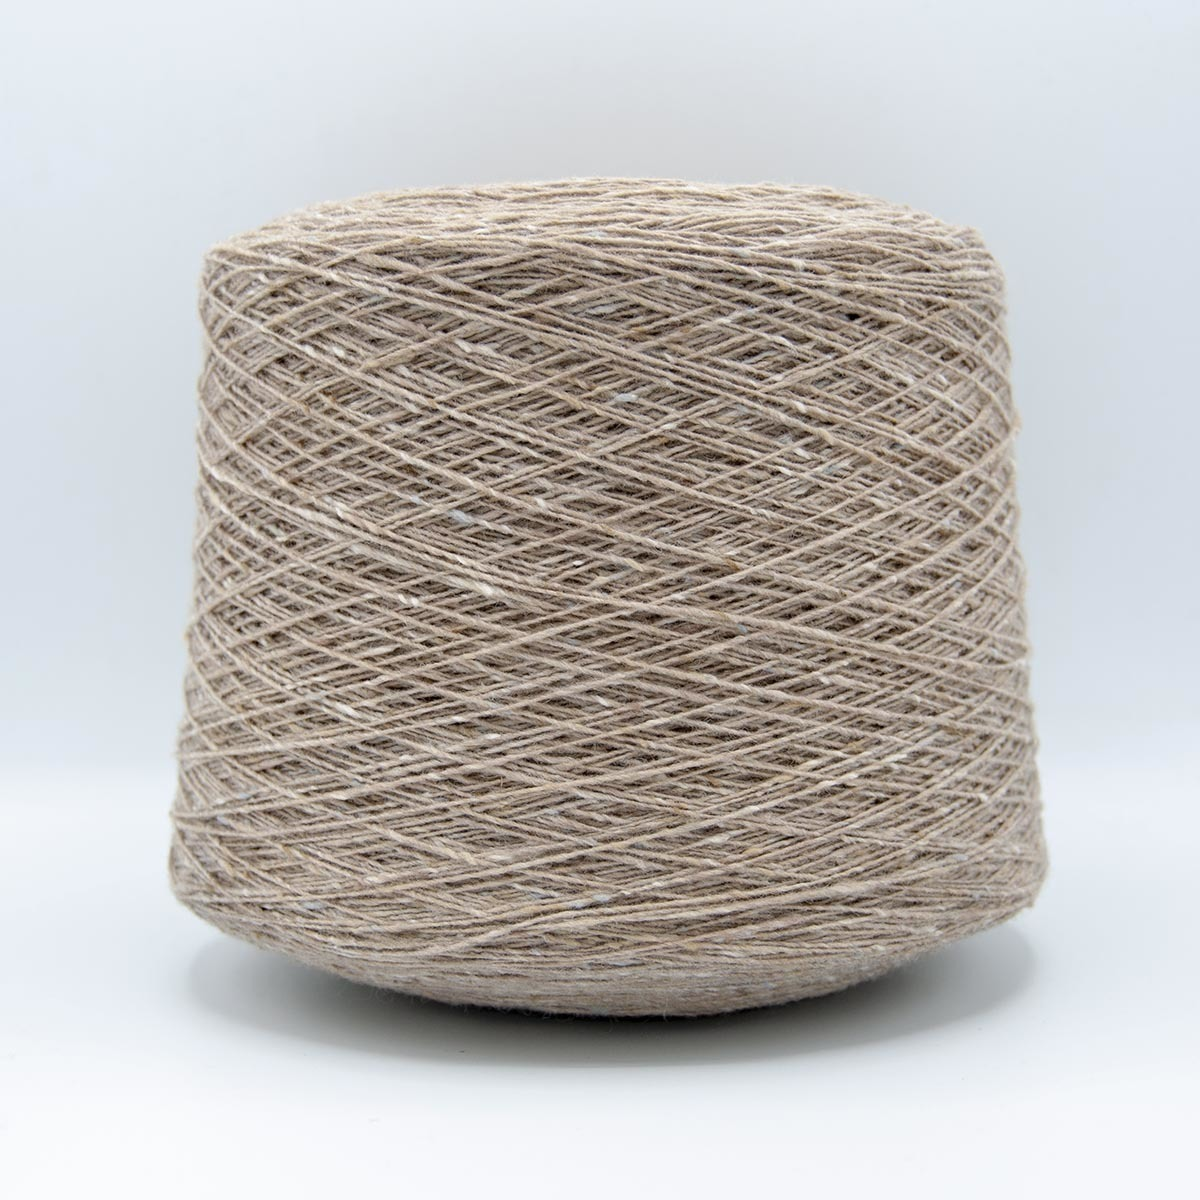 Knoll Yarns Soft Donegal (одинарный твид) - 5604